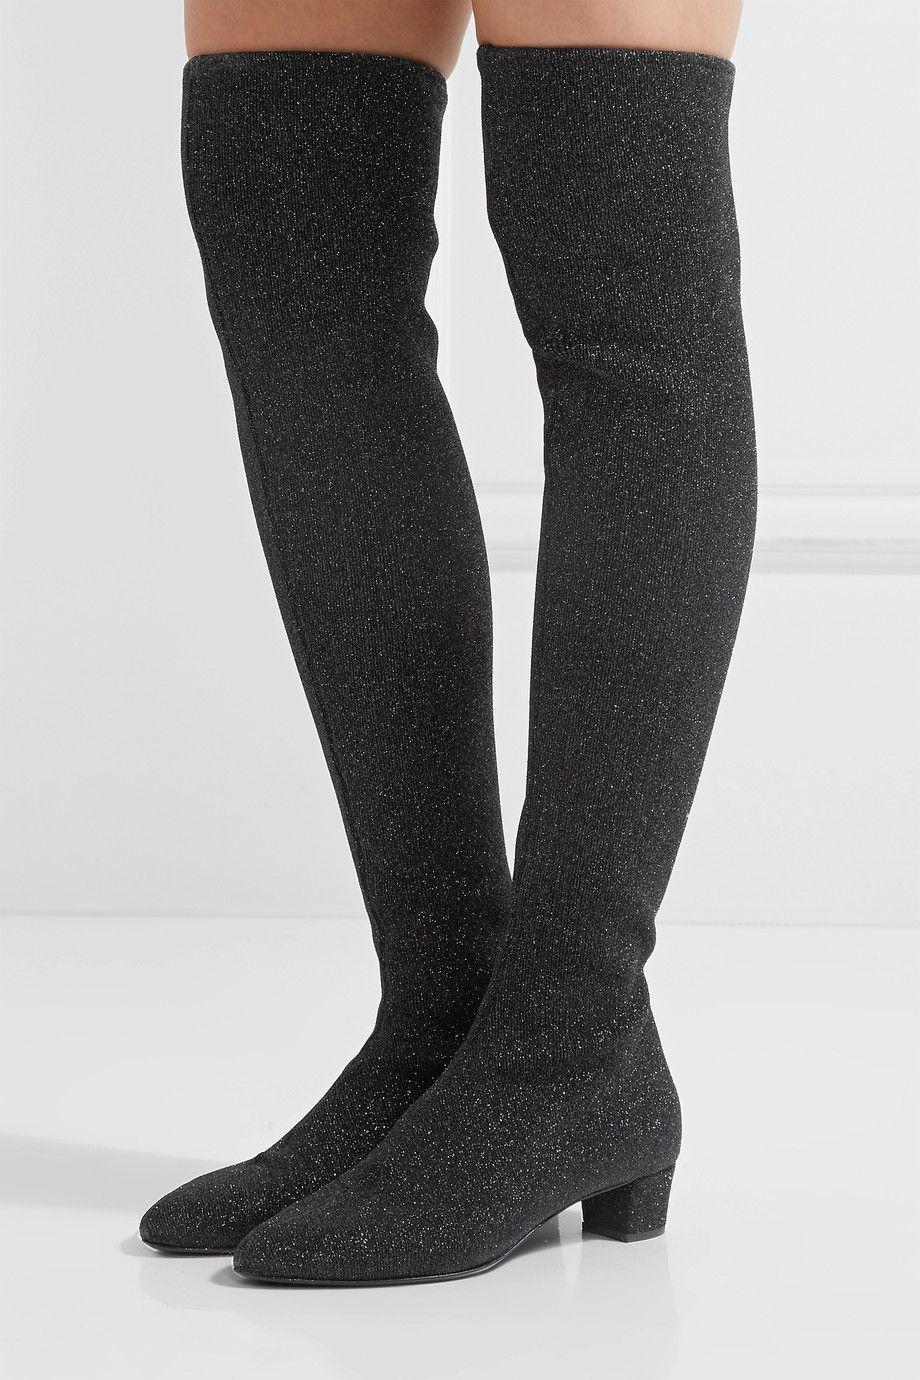 Giuseppe Zanotti Glitter Stretch-Knit Boots